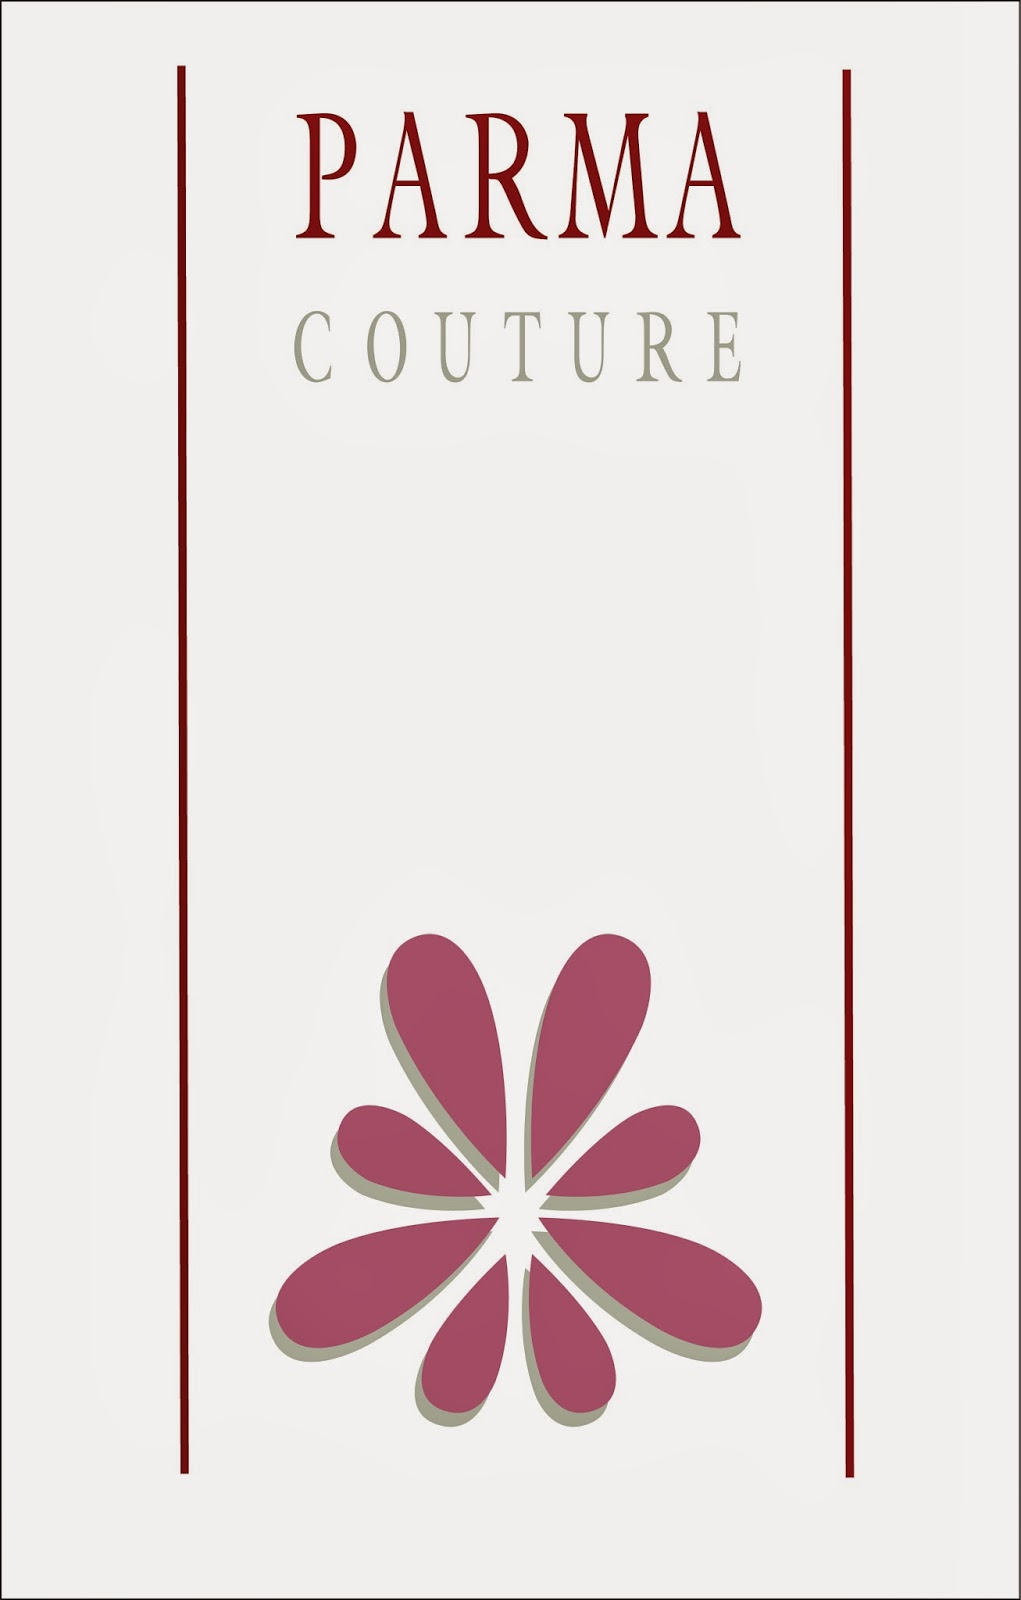 Logo Parma Couture